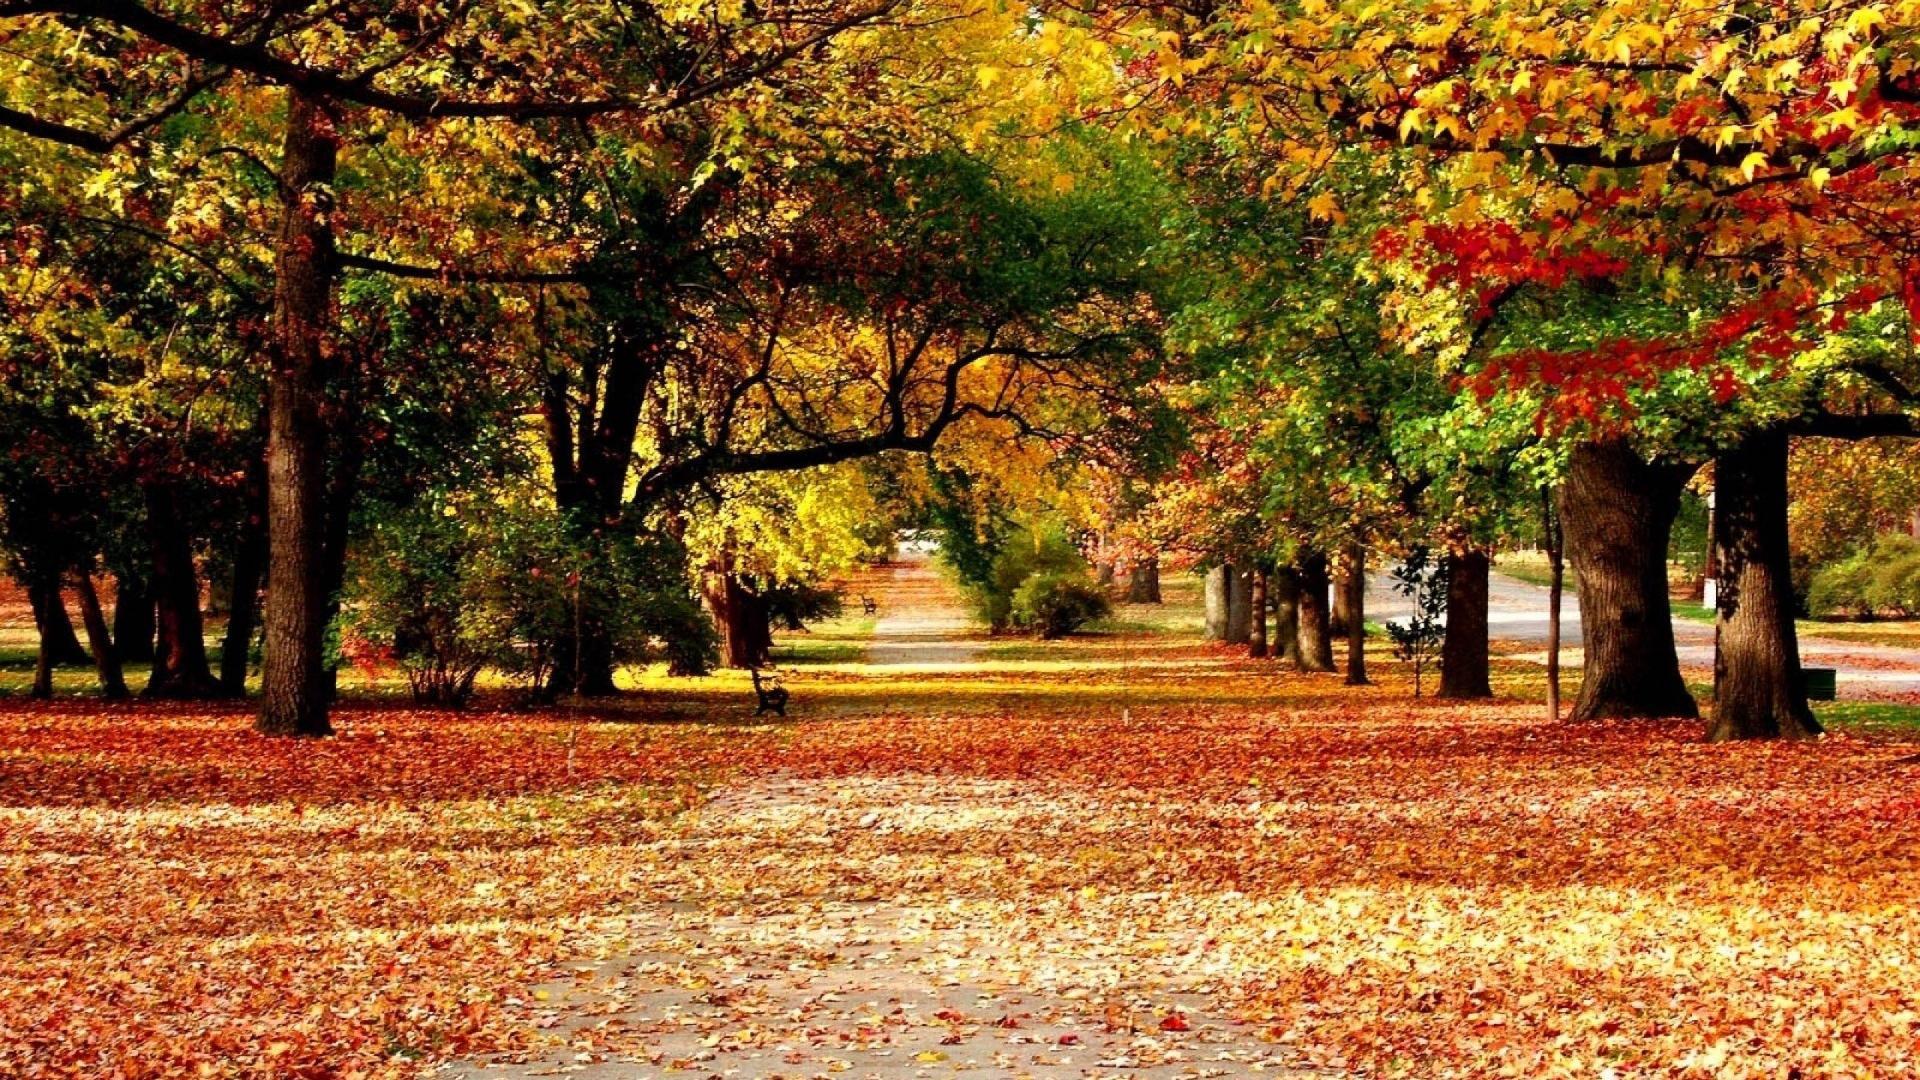 Autumn park wallpaper | (86207)